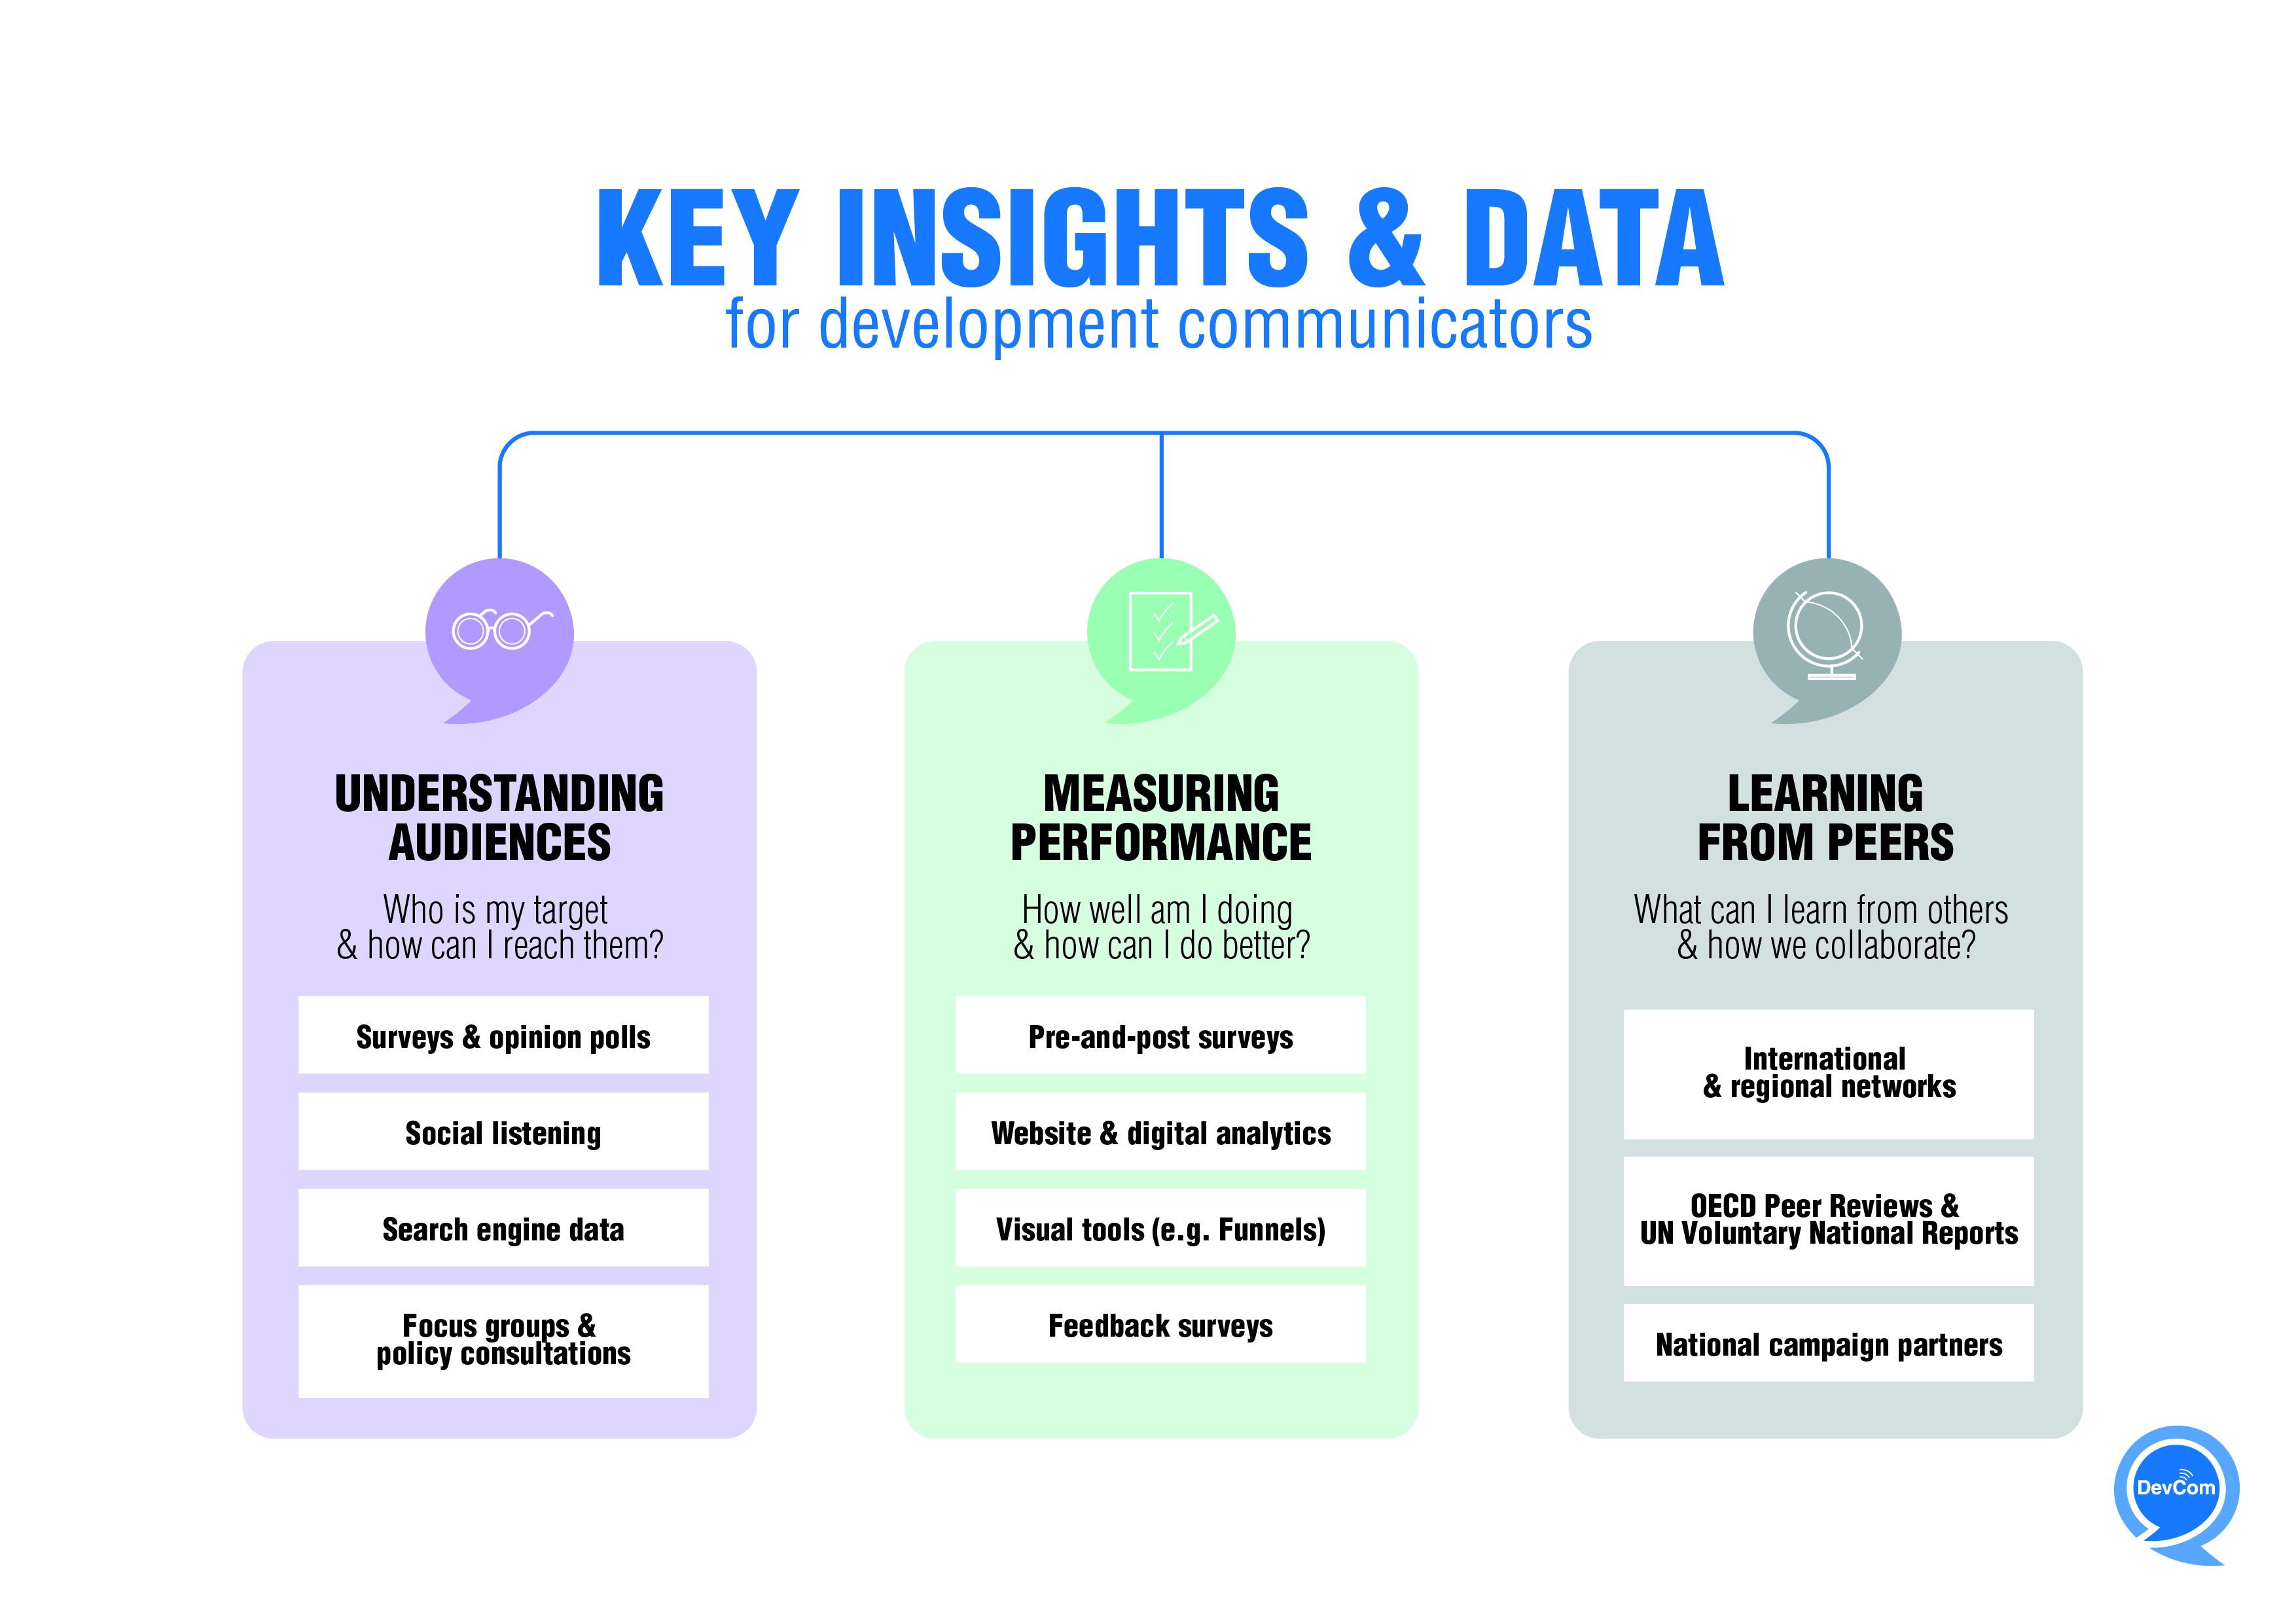 Infographic - key insights & data for development communicators